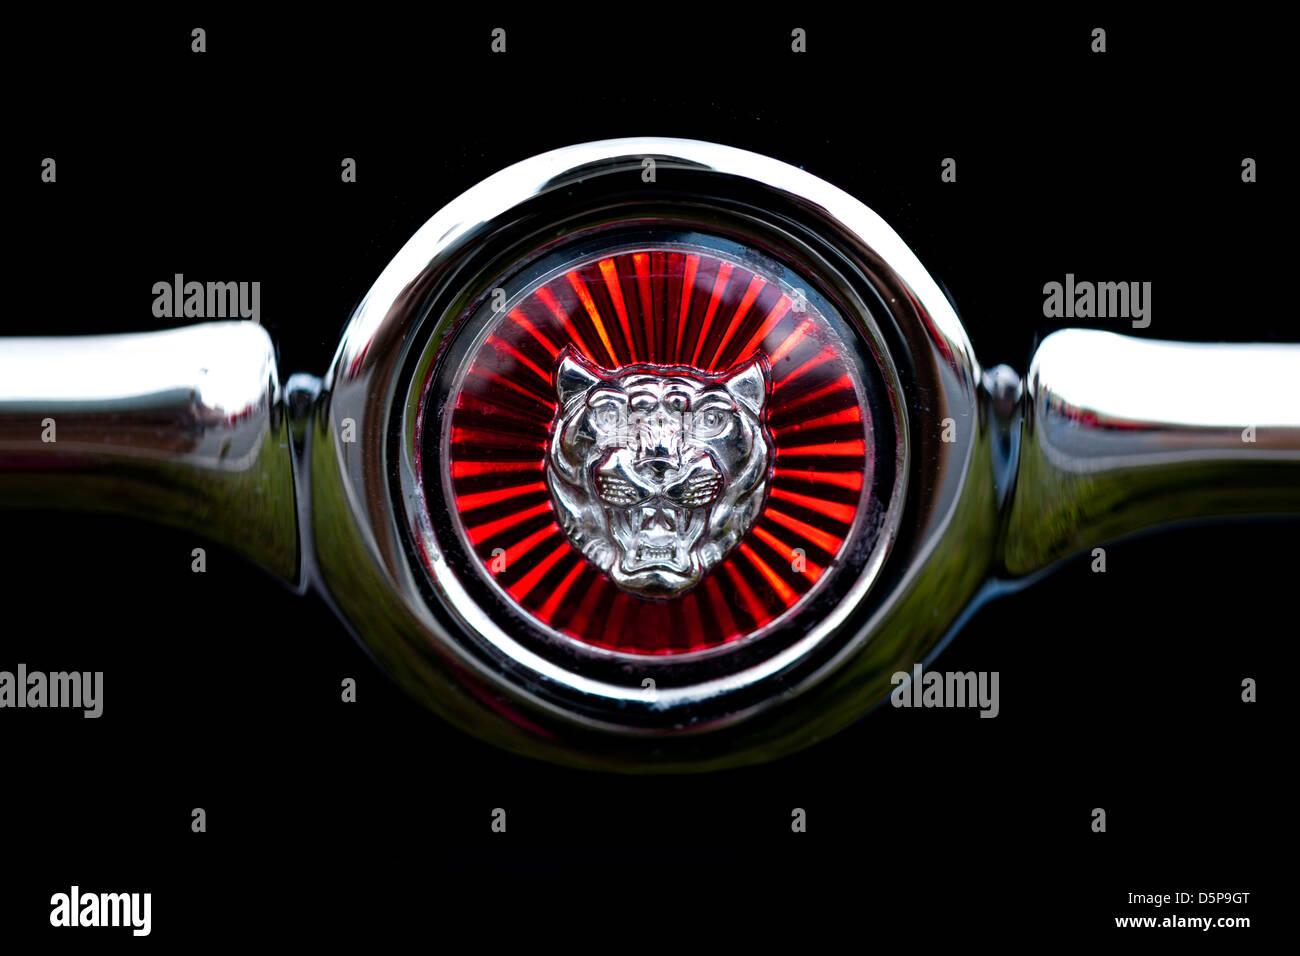 Jaguar emblem - Stock Image